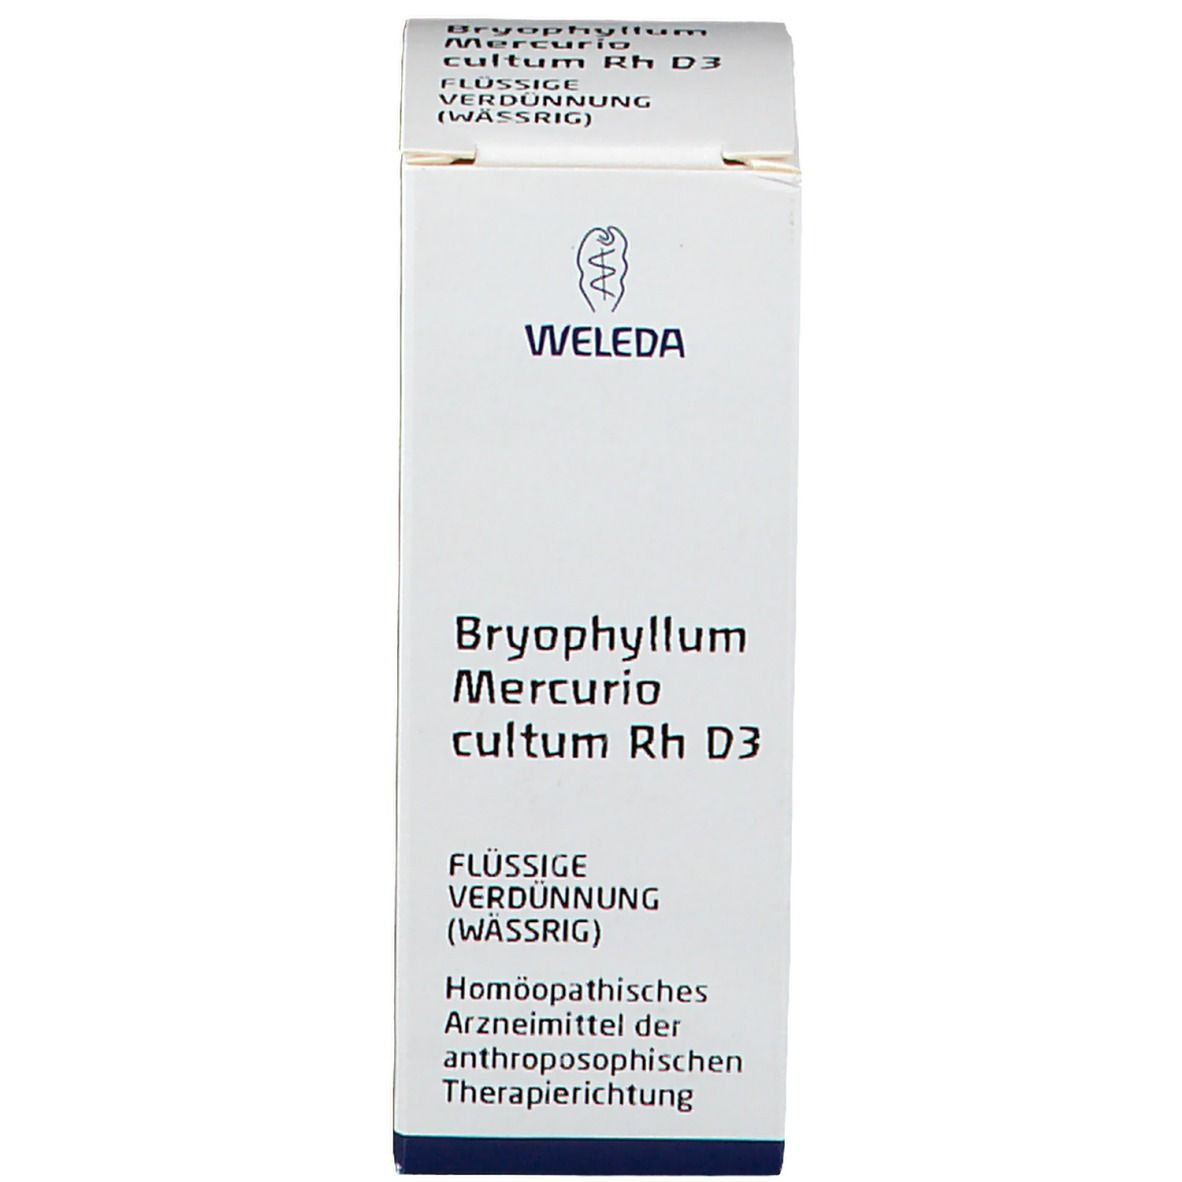 Weleda Bryophyllum Mercurio Cultum Rh D3 Dilution